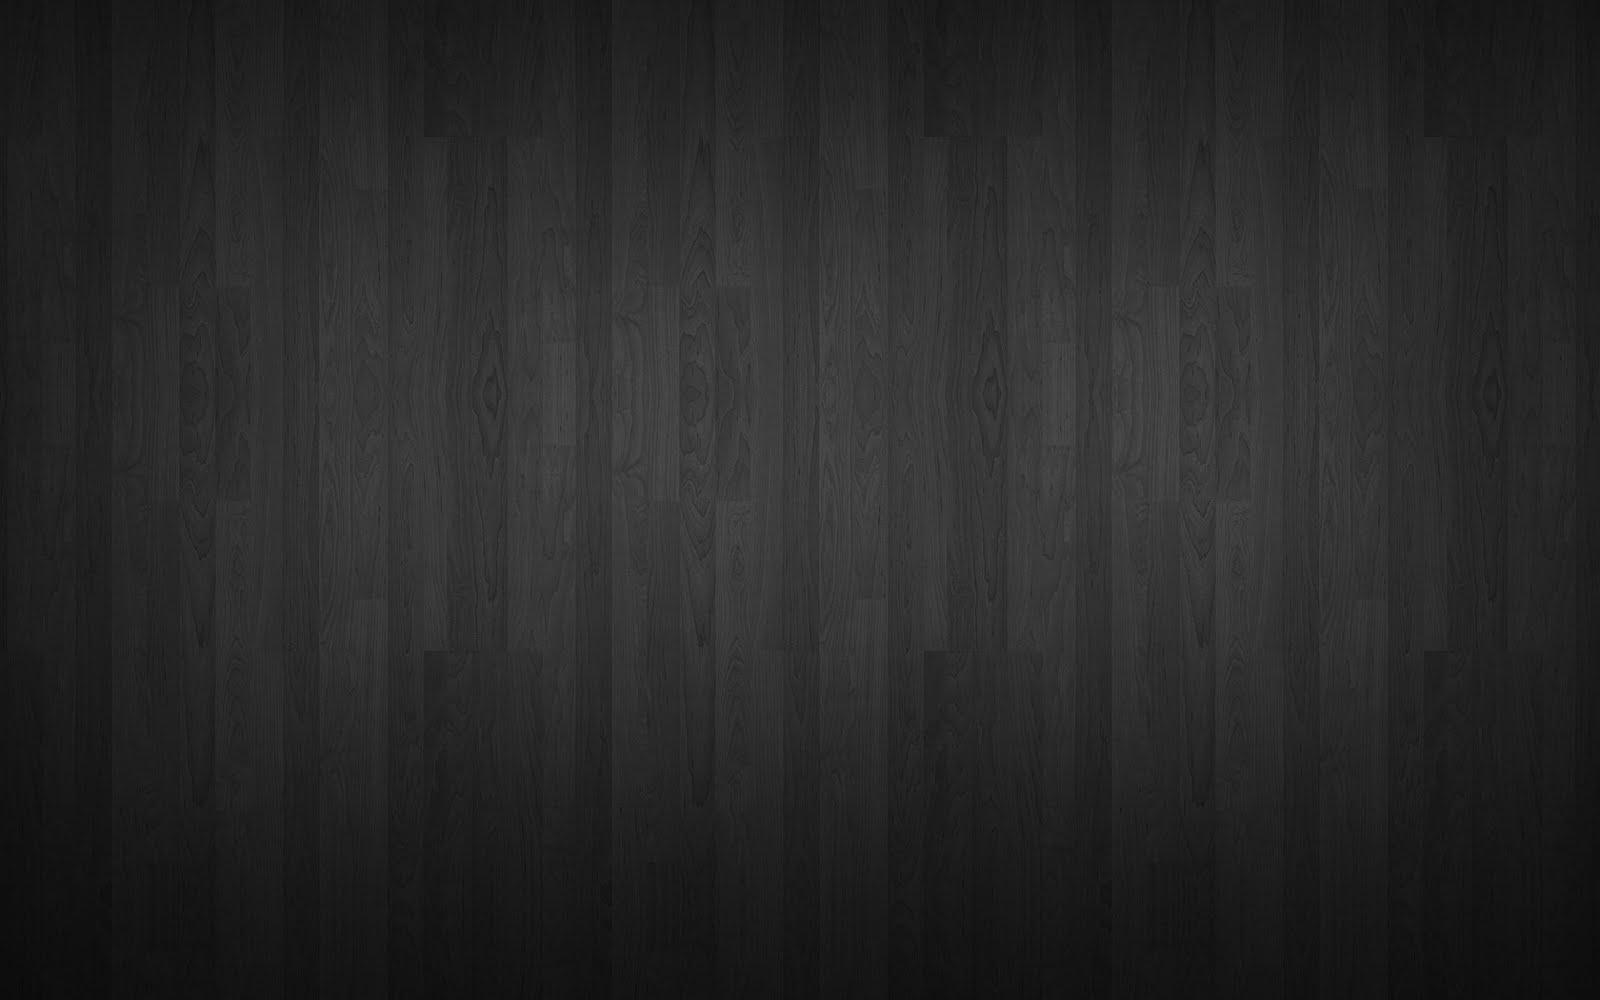 pin minimalistic wood wallpaper - photo #30